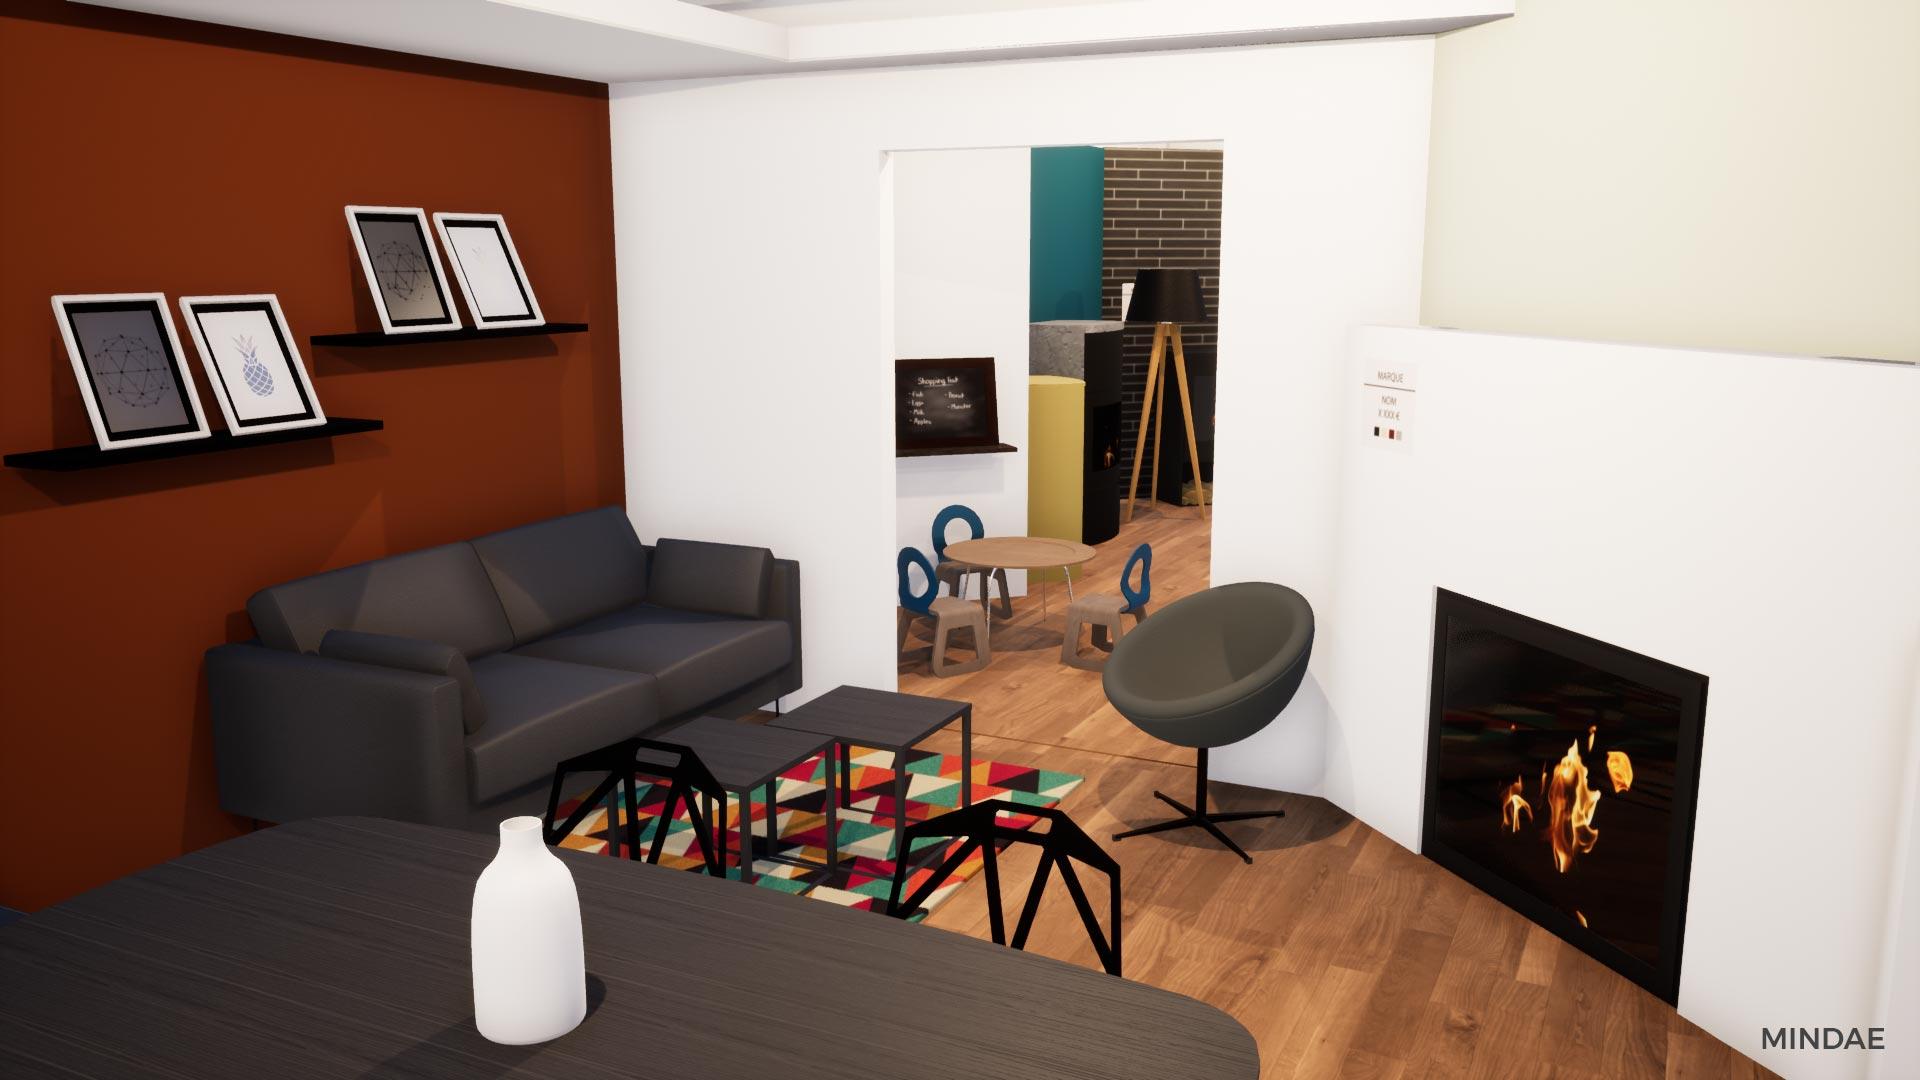 Mindae_3D_projet_agencement_poele_bois_cheminee_showroom_flamdesign_magasin_mondeville-(10)